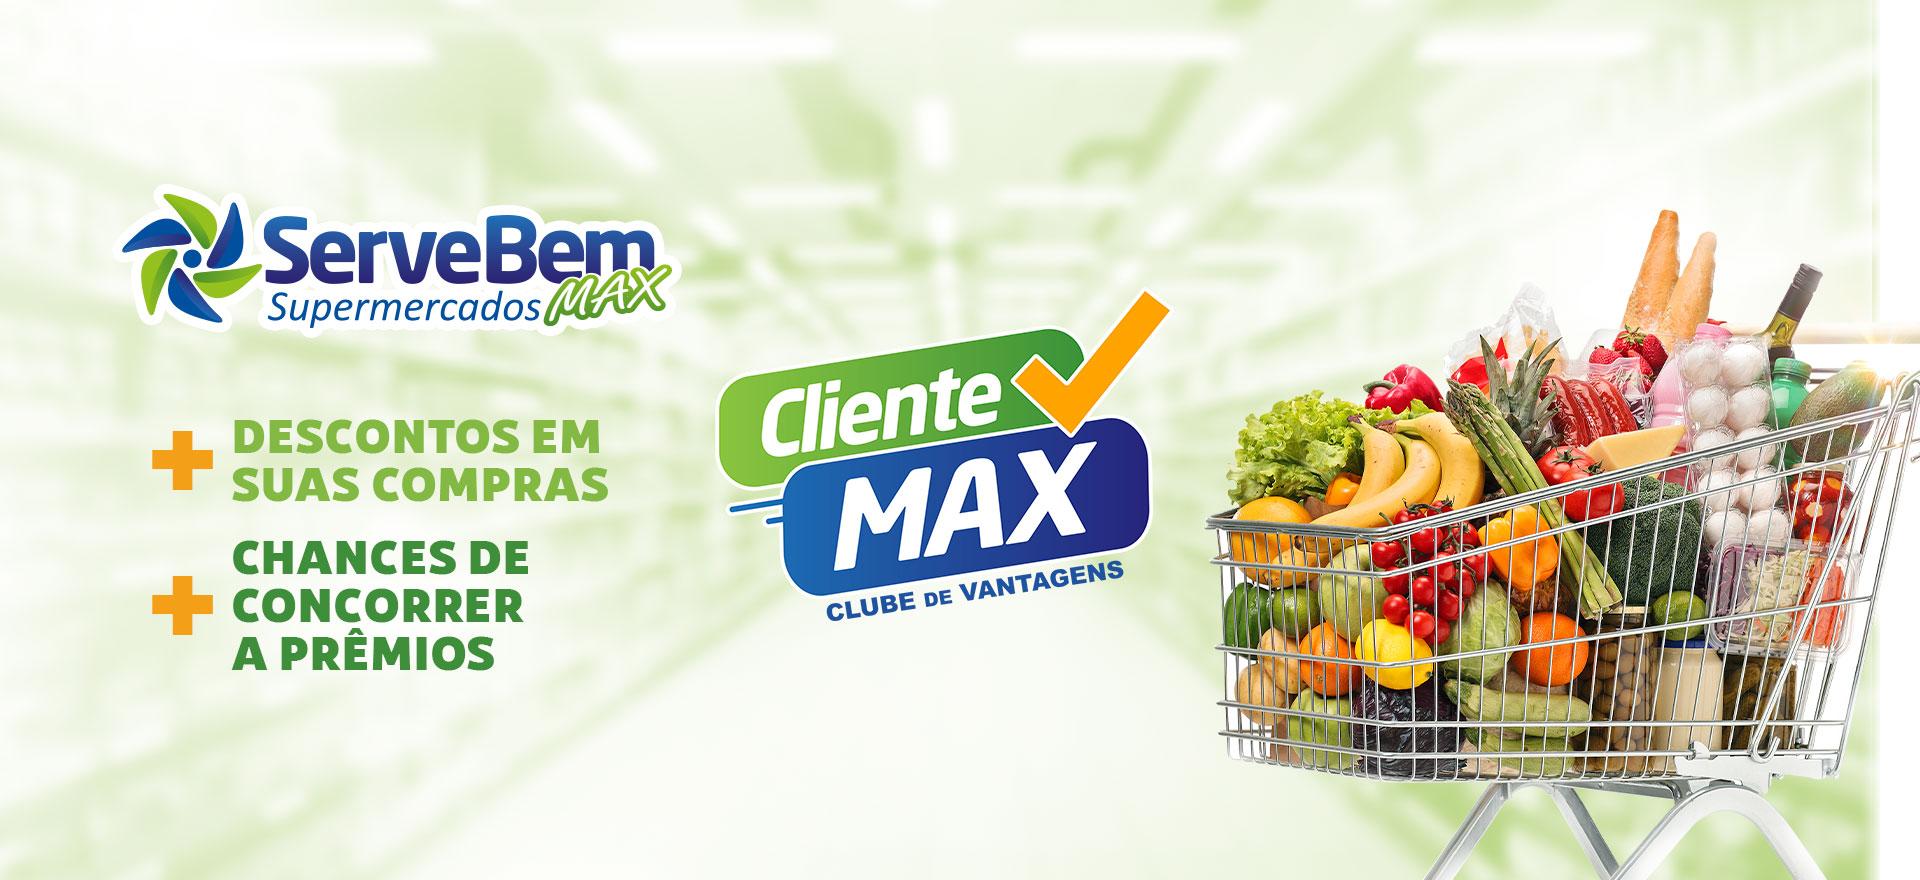 CLIENTE MAX